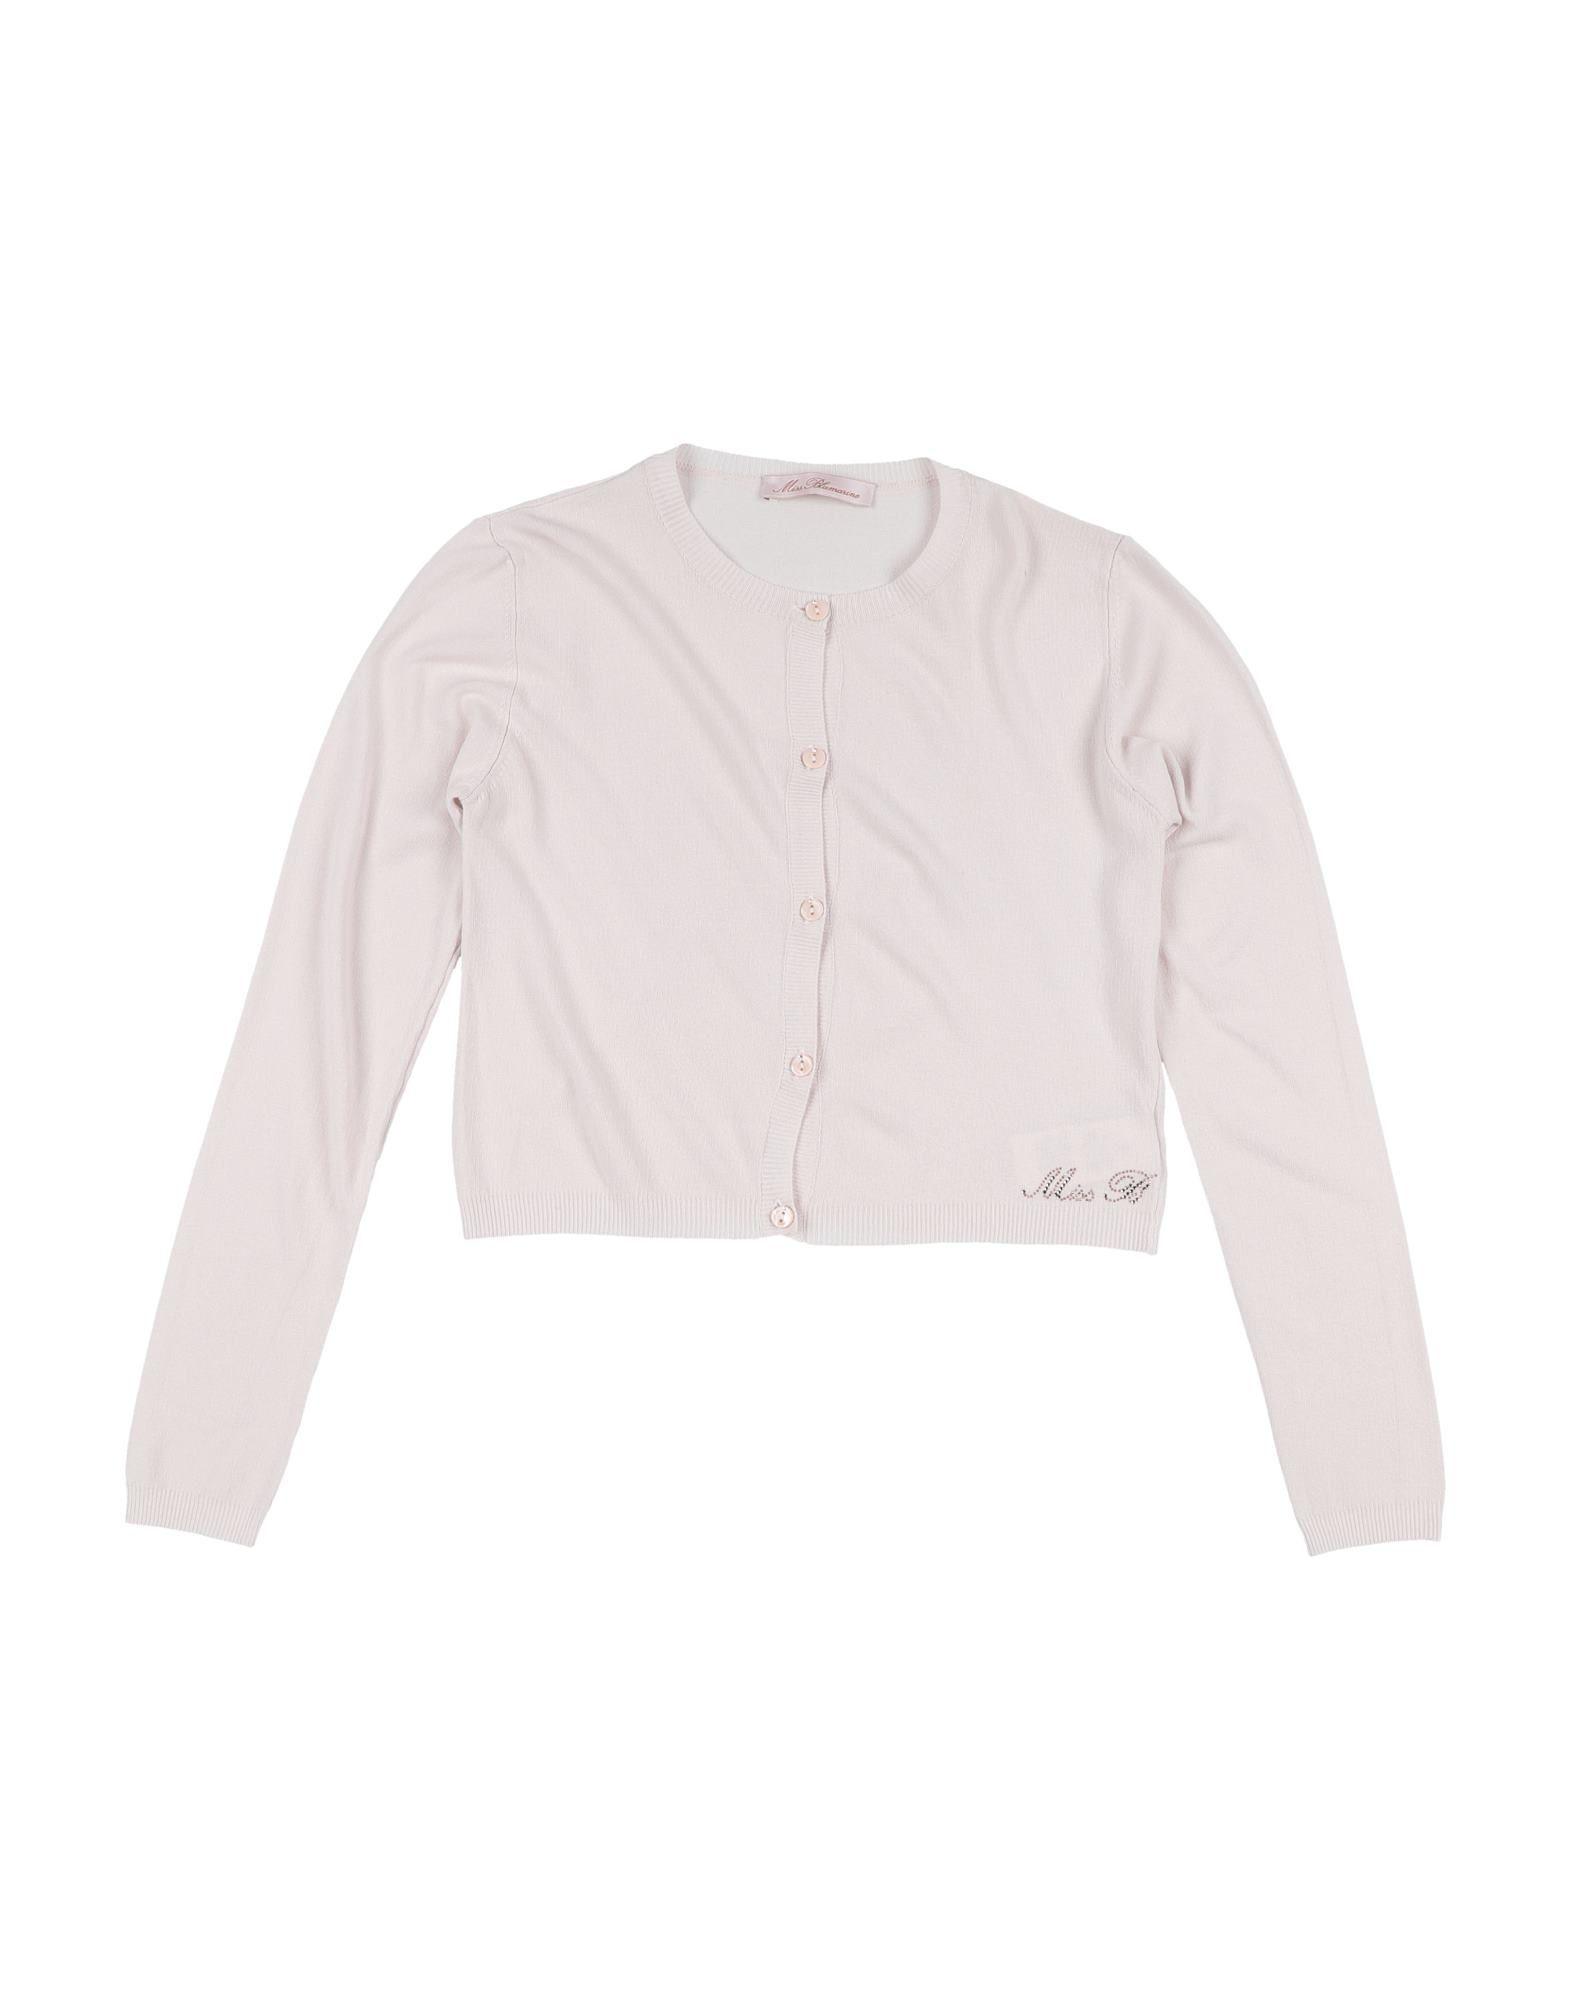 BLUMARINE | MISS BLUMARINE Cardigans 39978465 | Goxip